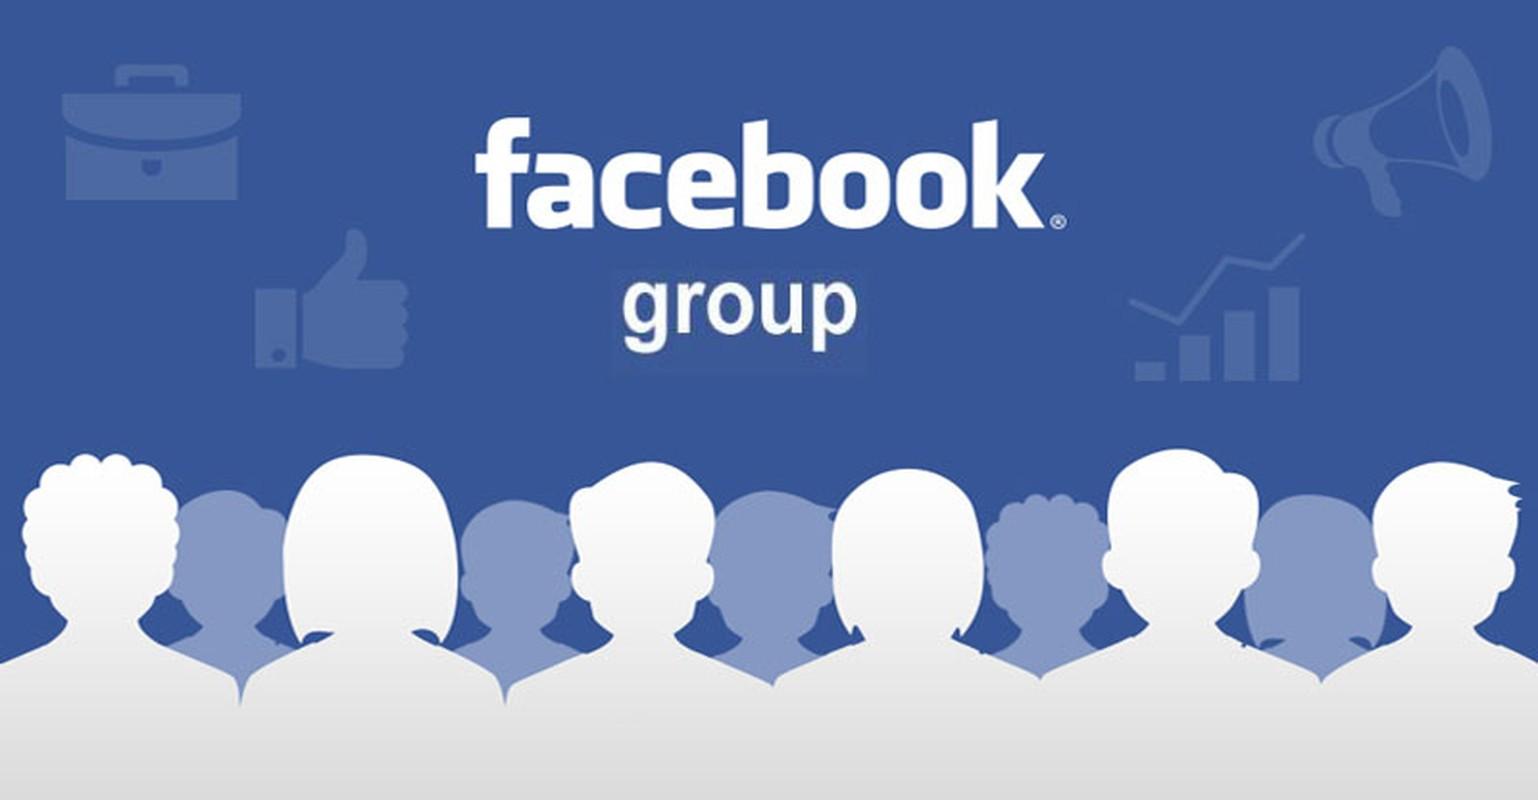 14 su that den toi ve Facebook duoc phoi bay-Hinh-11